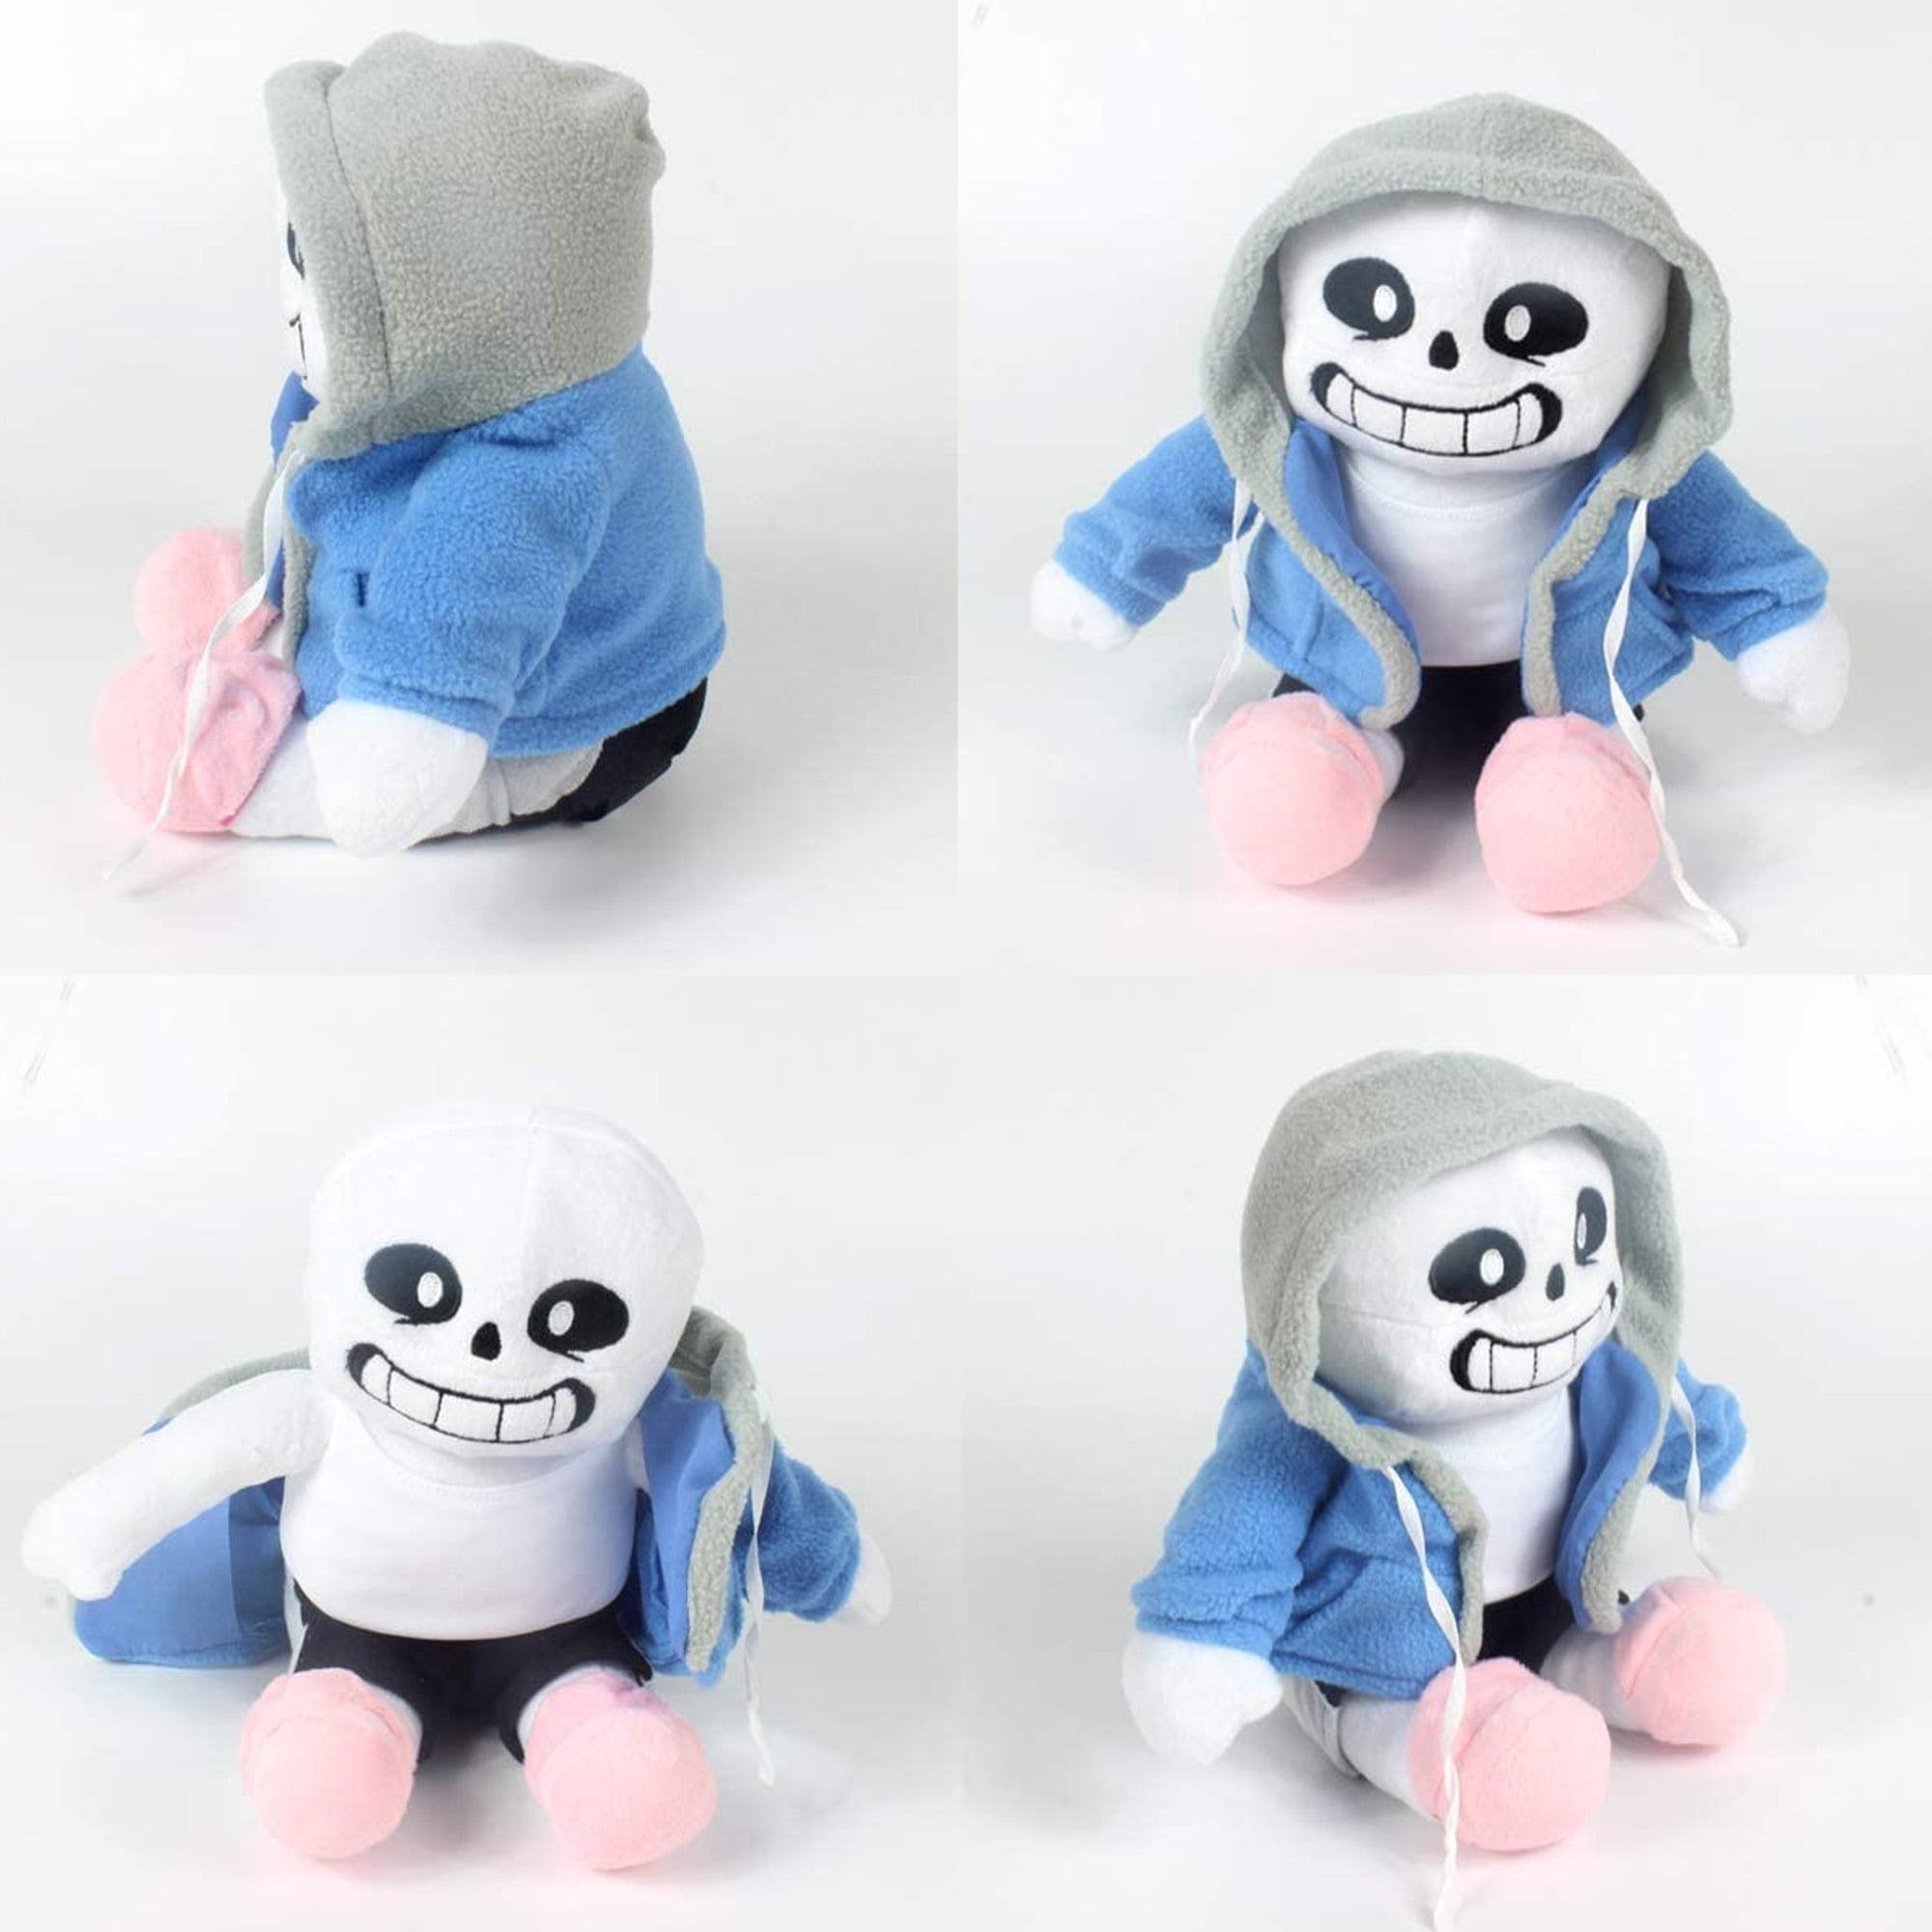 Undertale Sans Flower Plush Stuffed Doll Hugger Cushion Cosplay Kids Toy Gift